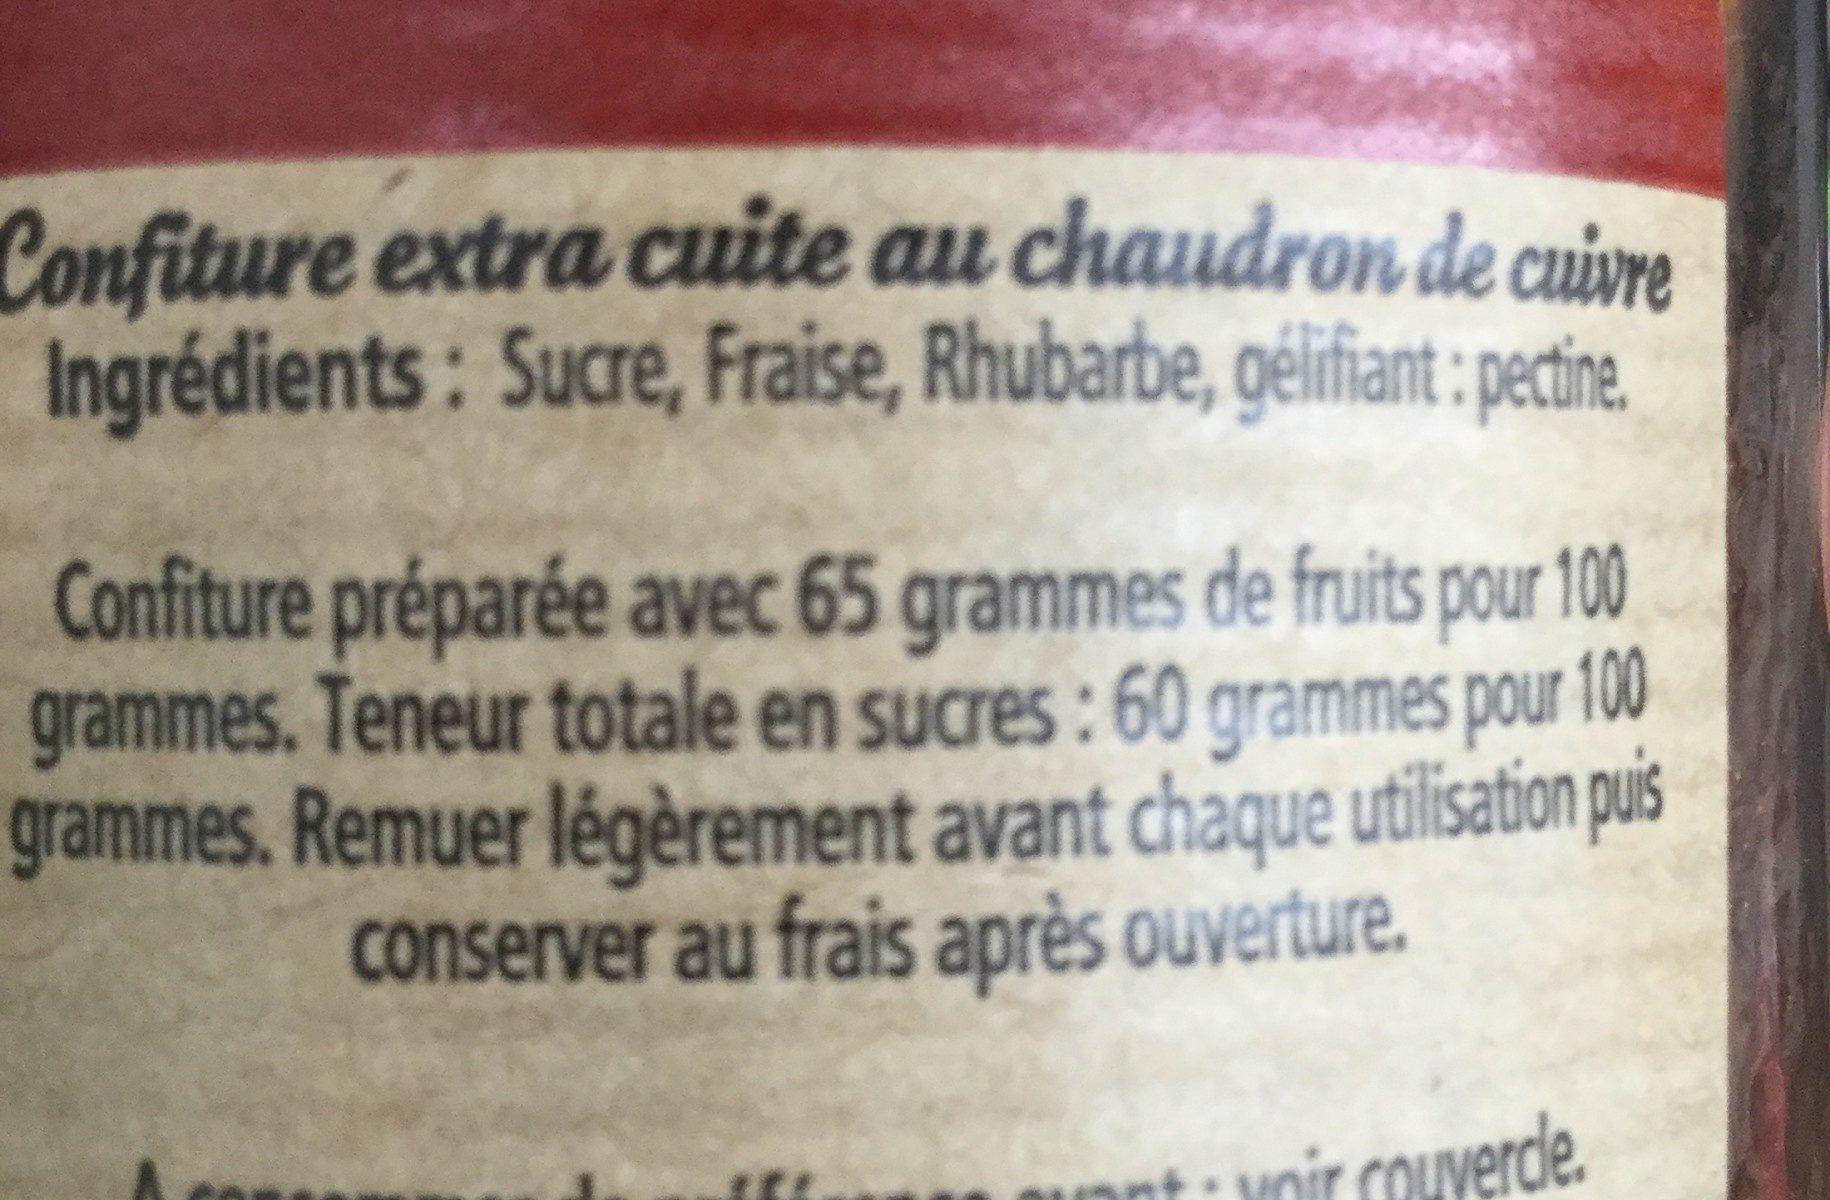 Fraise Rhubarbe - Ingrédients - fr